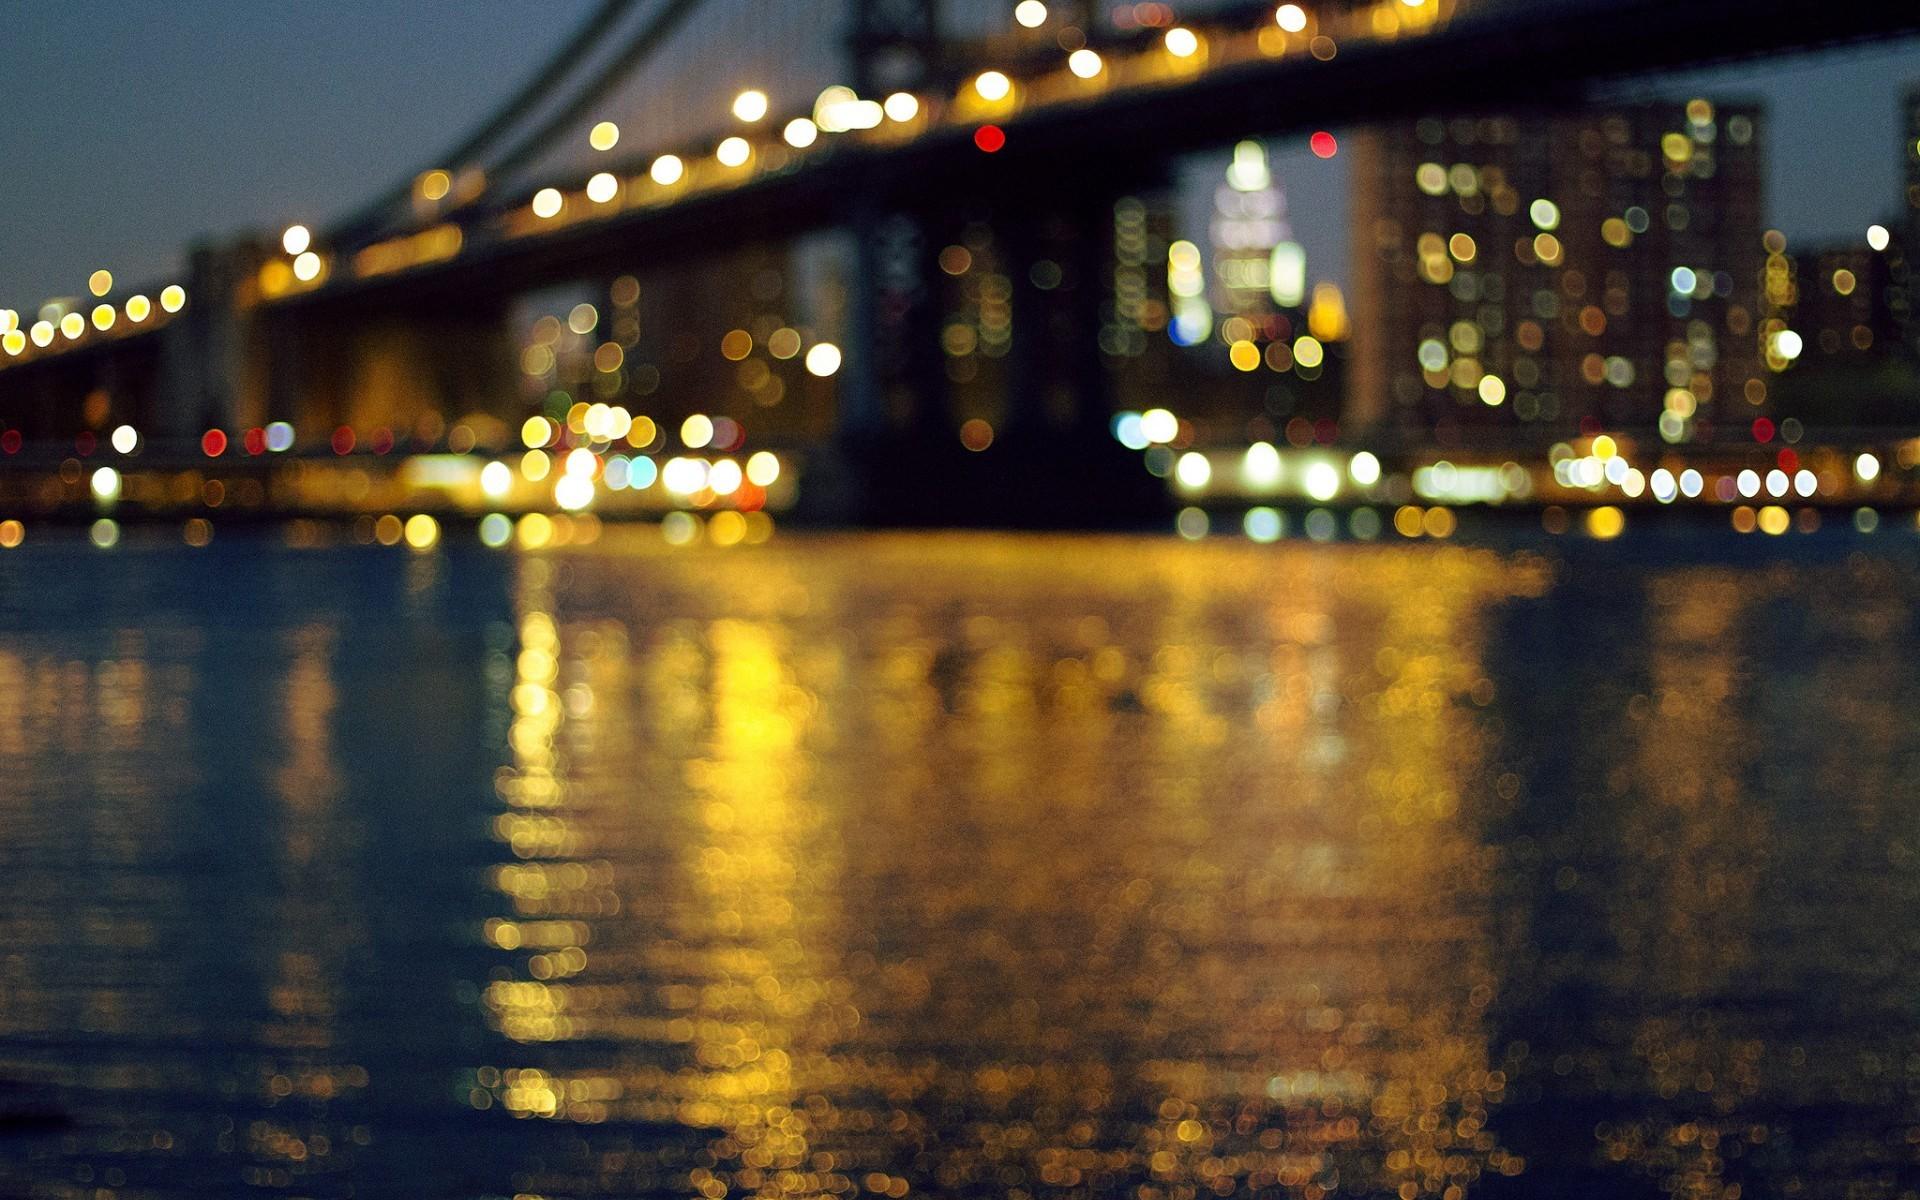 City Night Lights Wallpaper (42 Wallpapers)